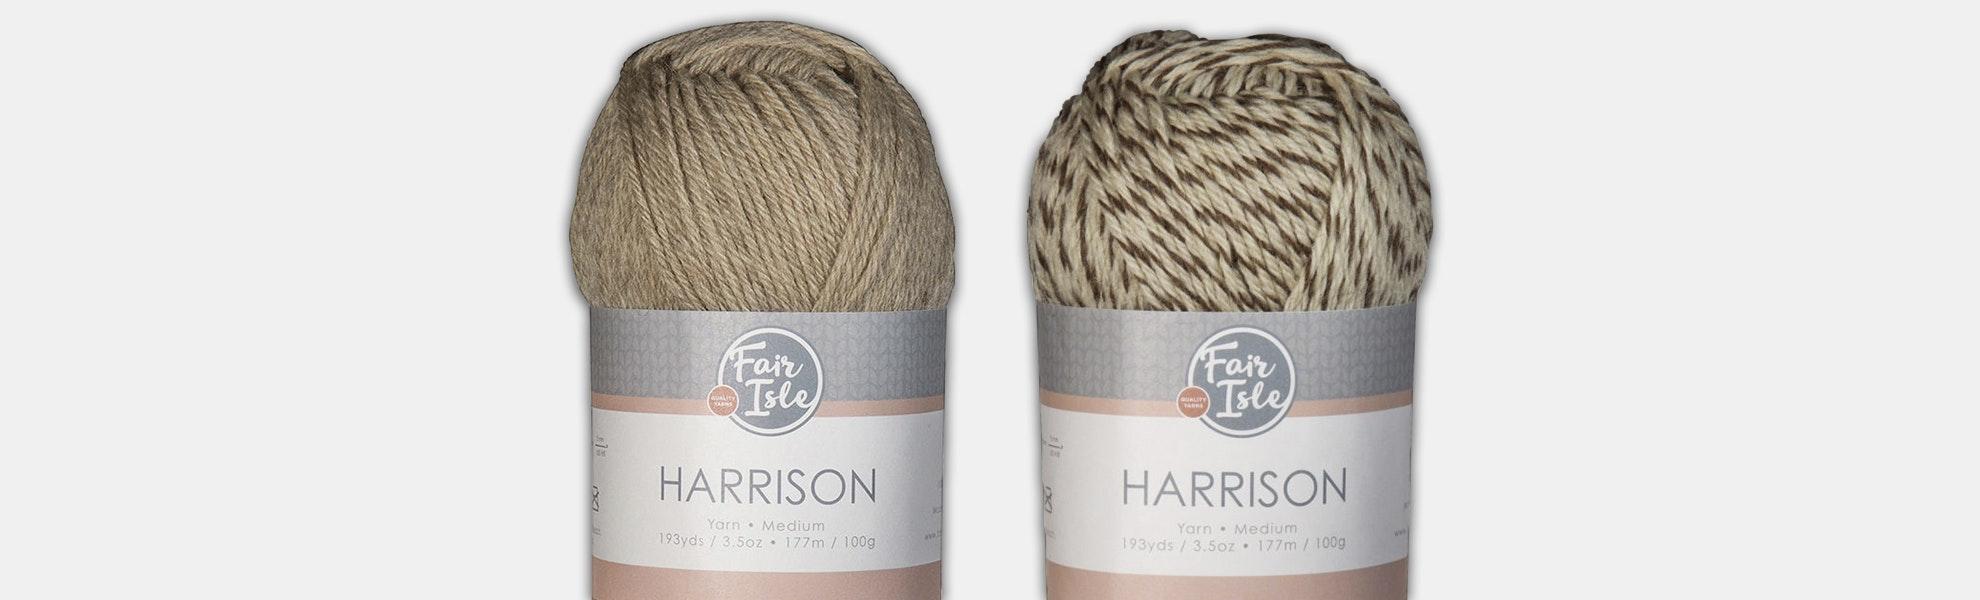 Harrison Yarn by Fair Isle (2-Pack) | Price & Reviews | Massdrop